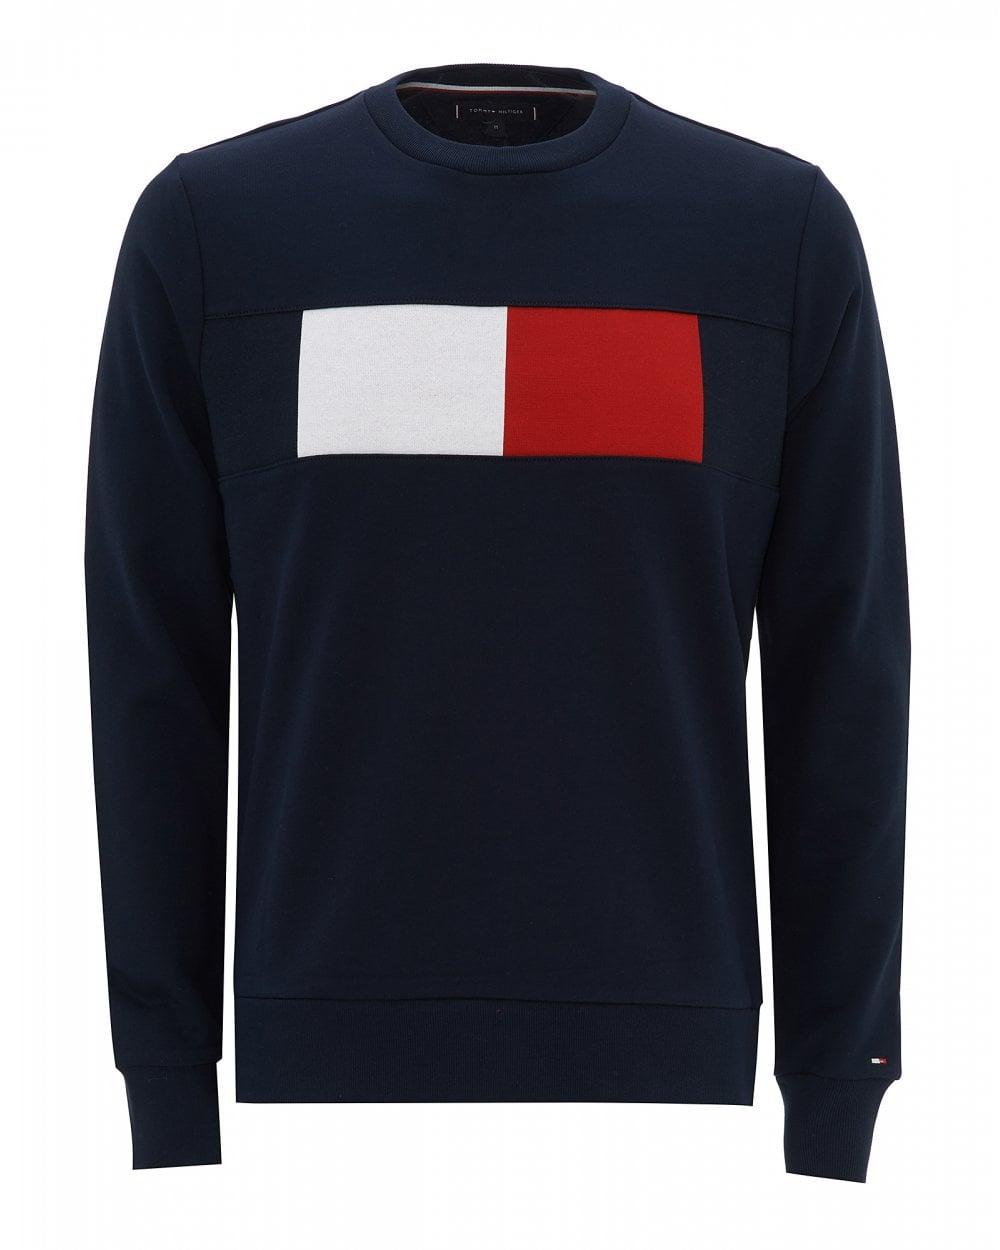 ddd4a2caa Tommy Hilfiger Mens Colour-Blocked Sweat, Regular Fit Flag Sweatshirt